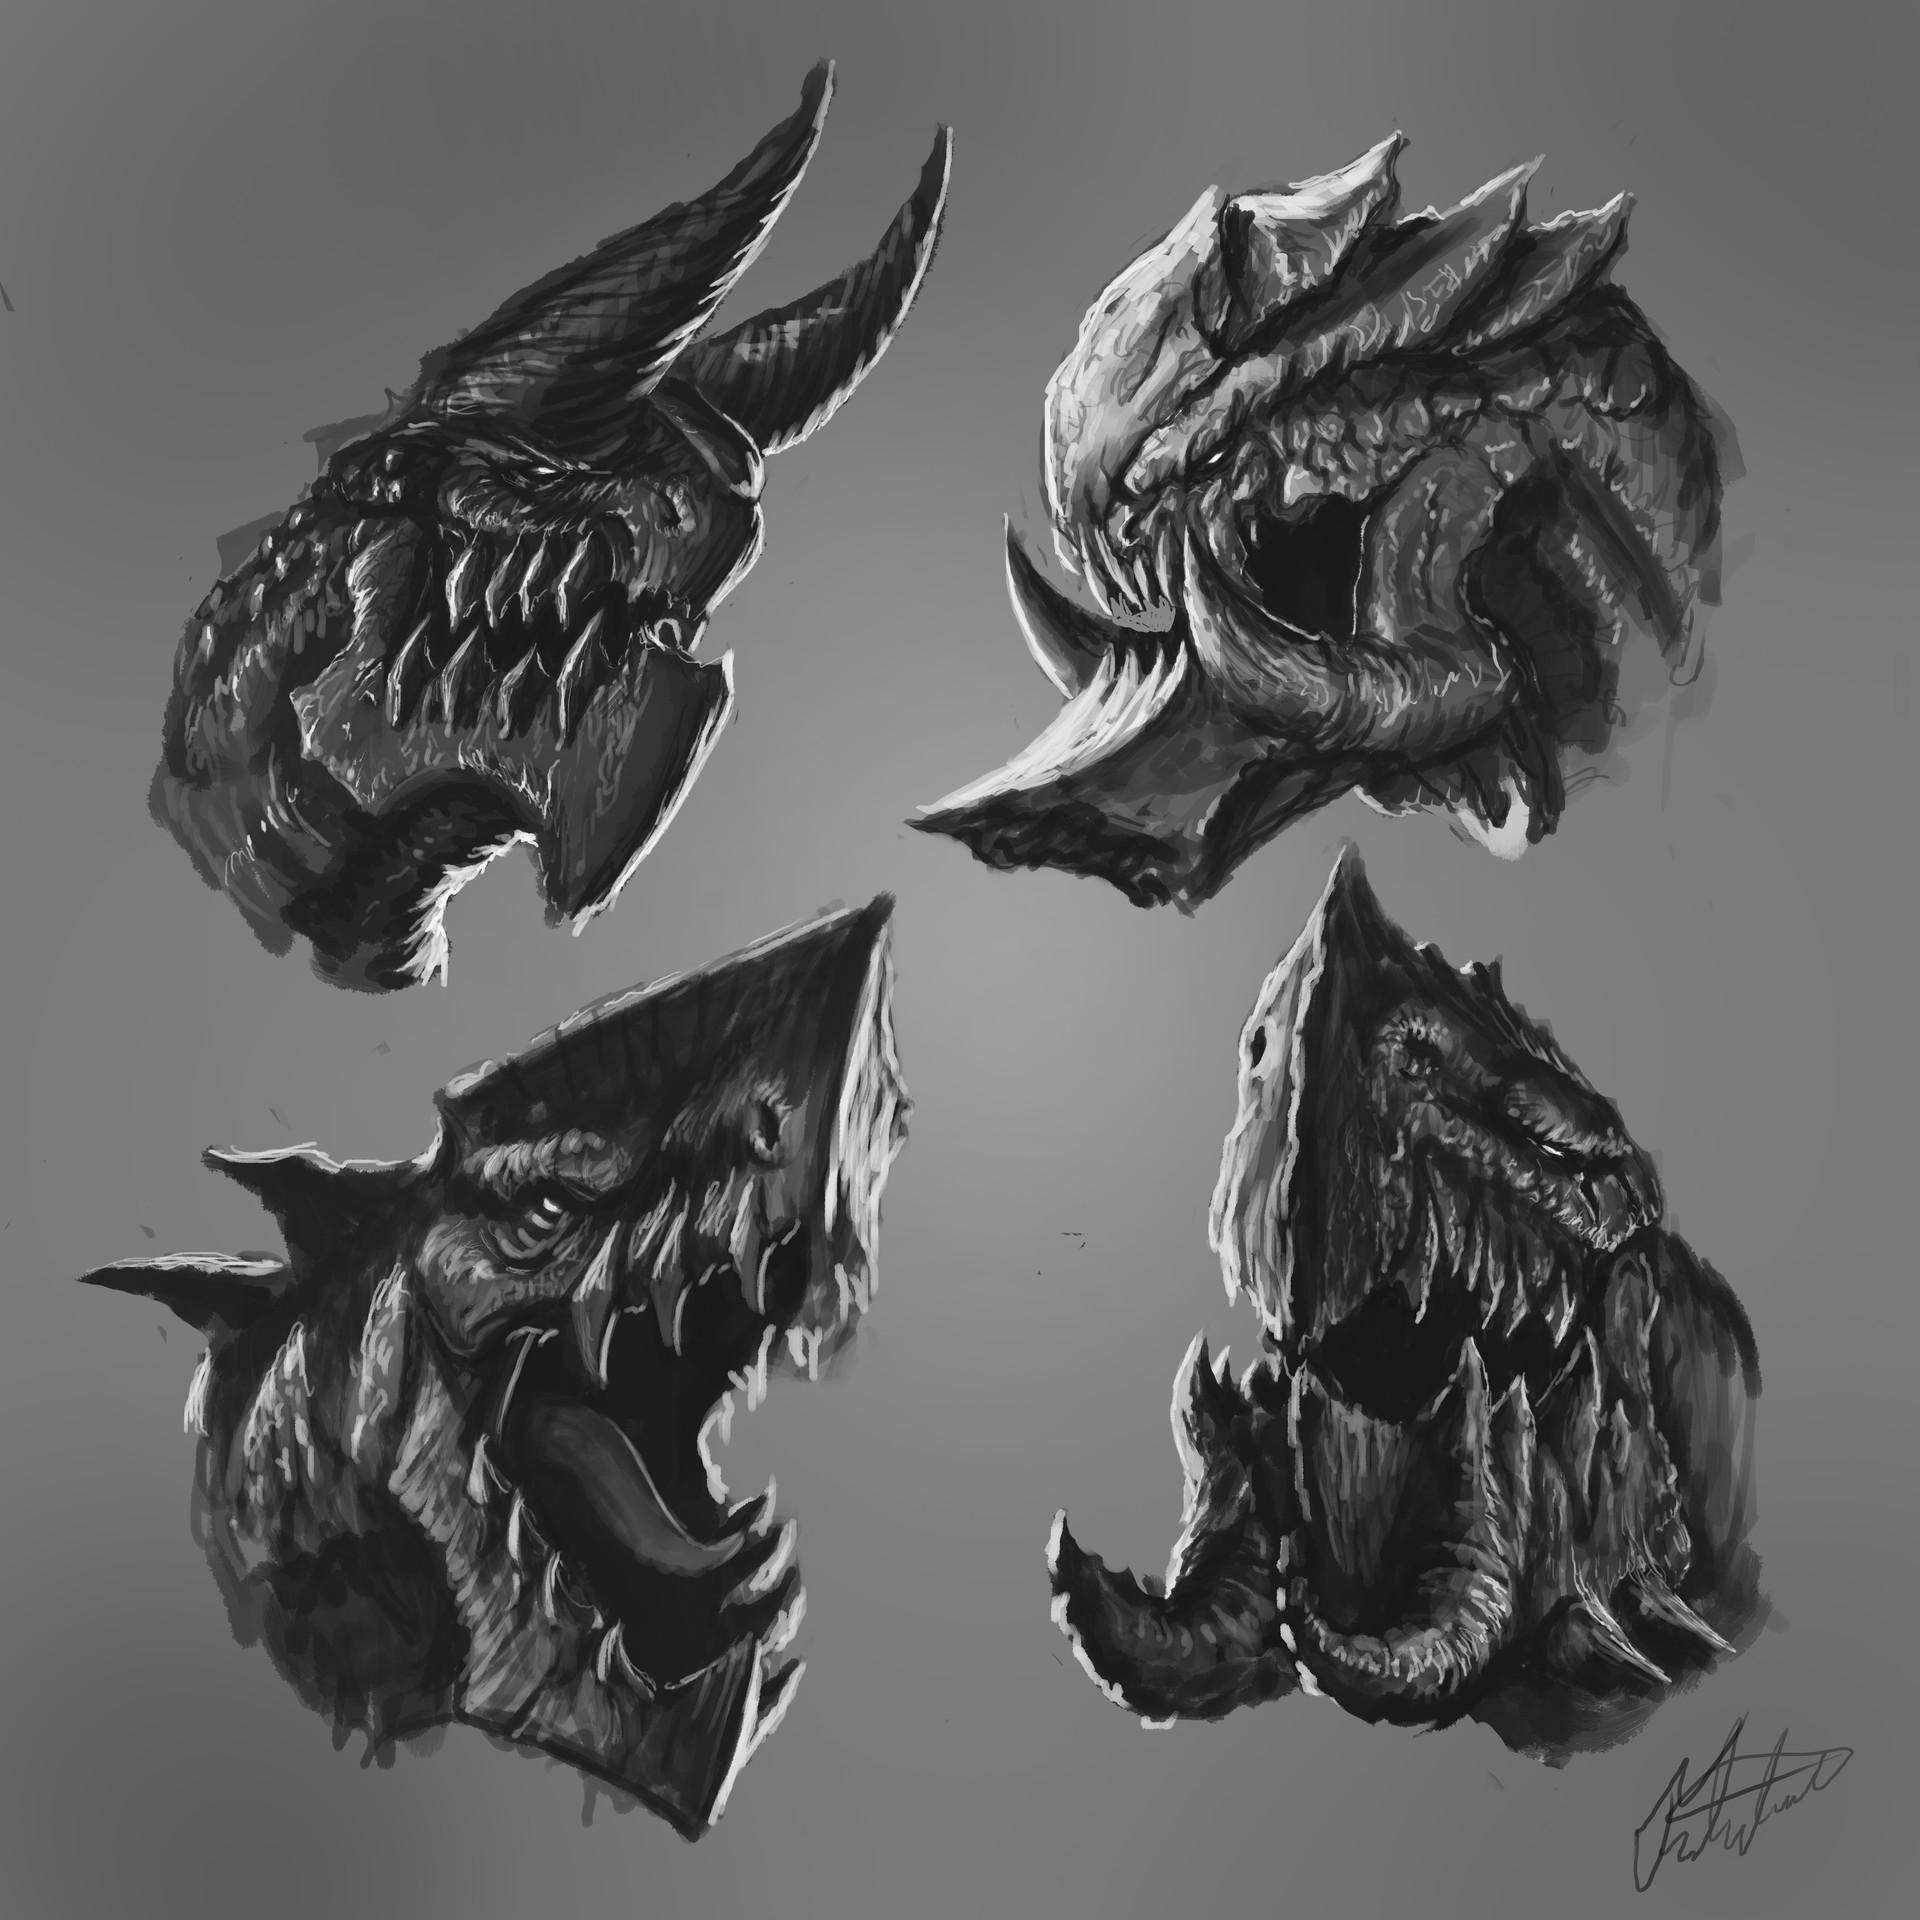 fred almén dragon head sketches